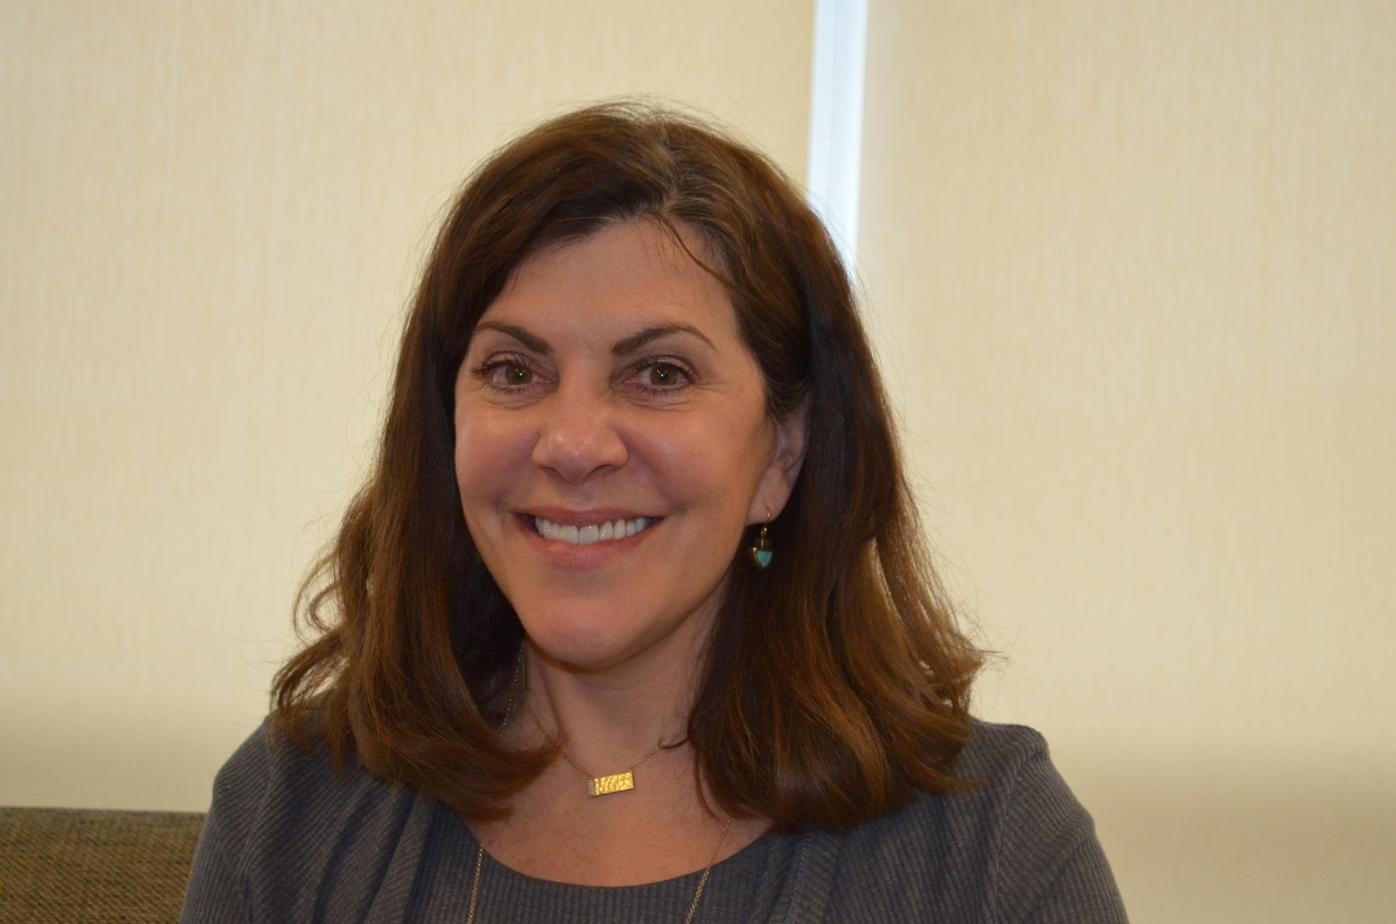 Kristen Lane, Central Blood Bank marketing lead